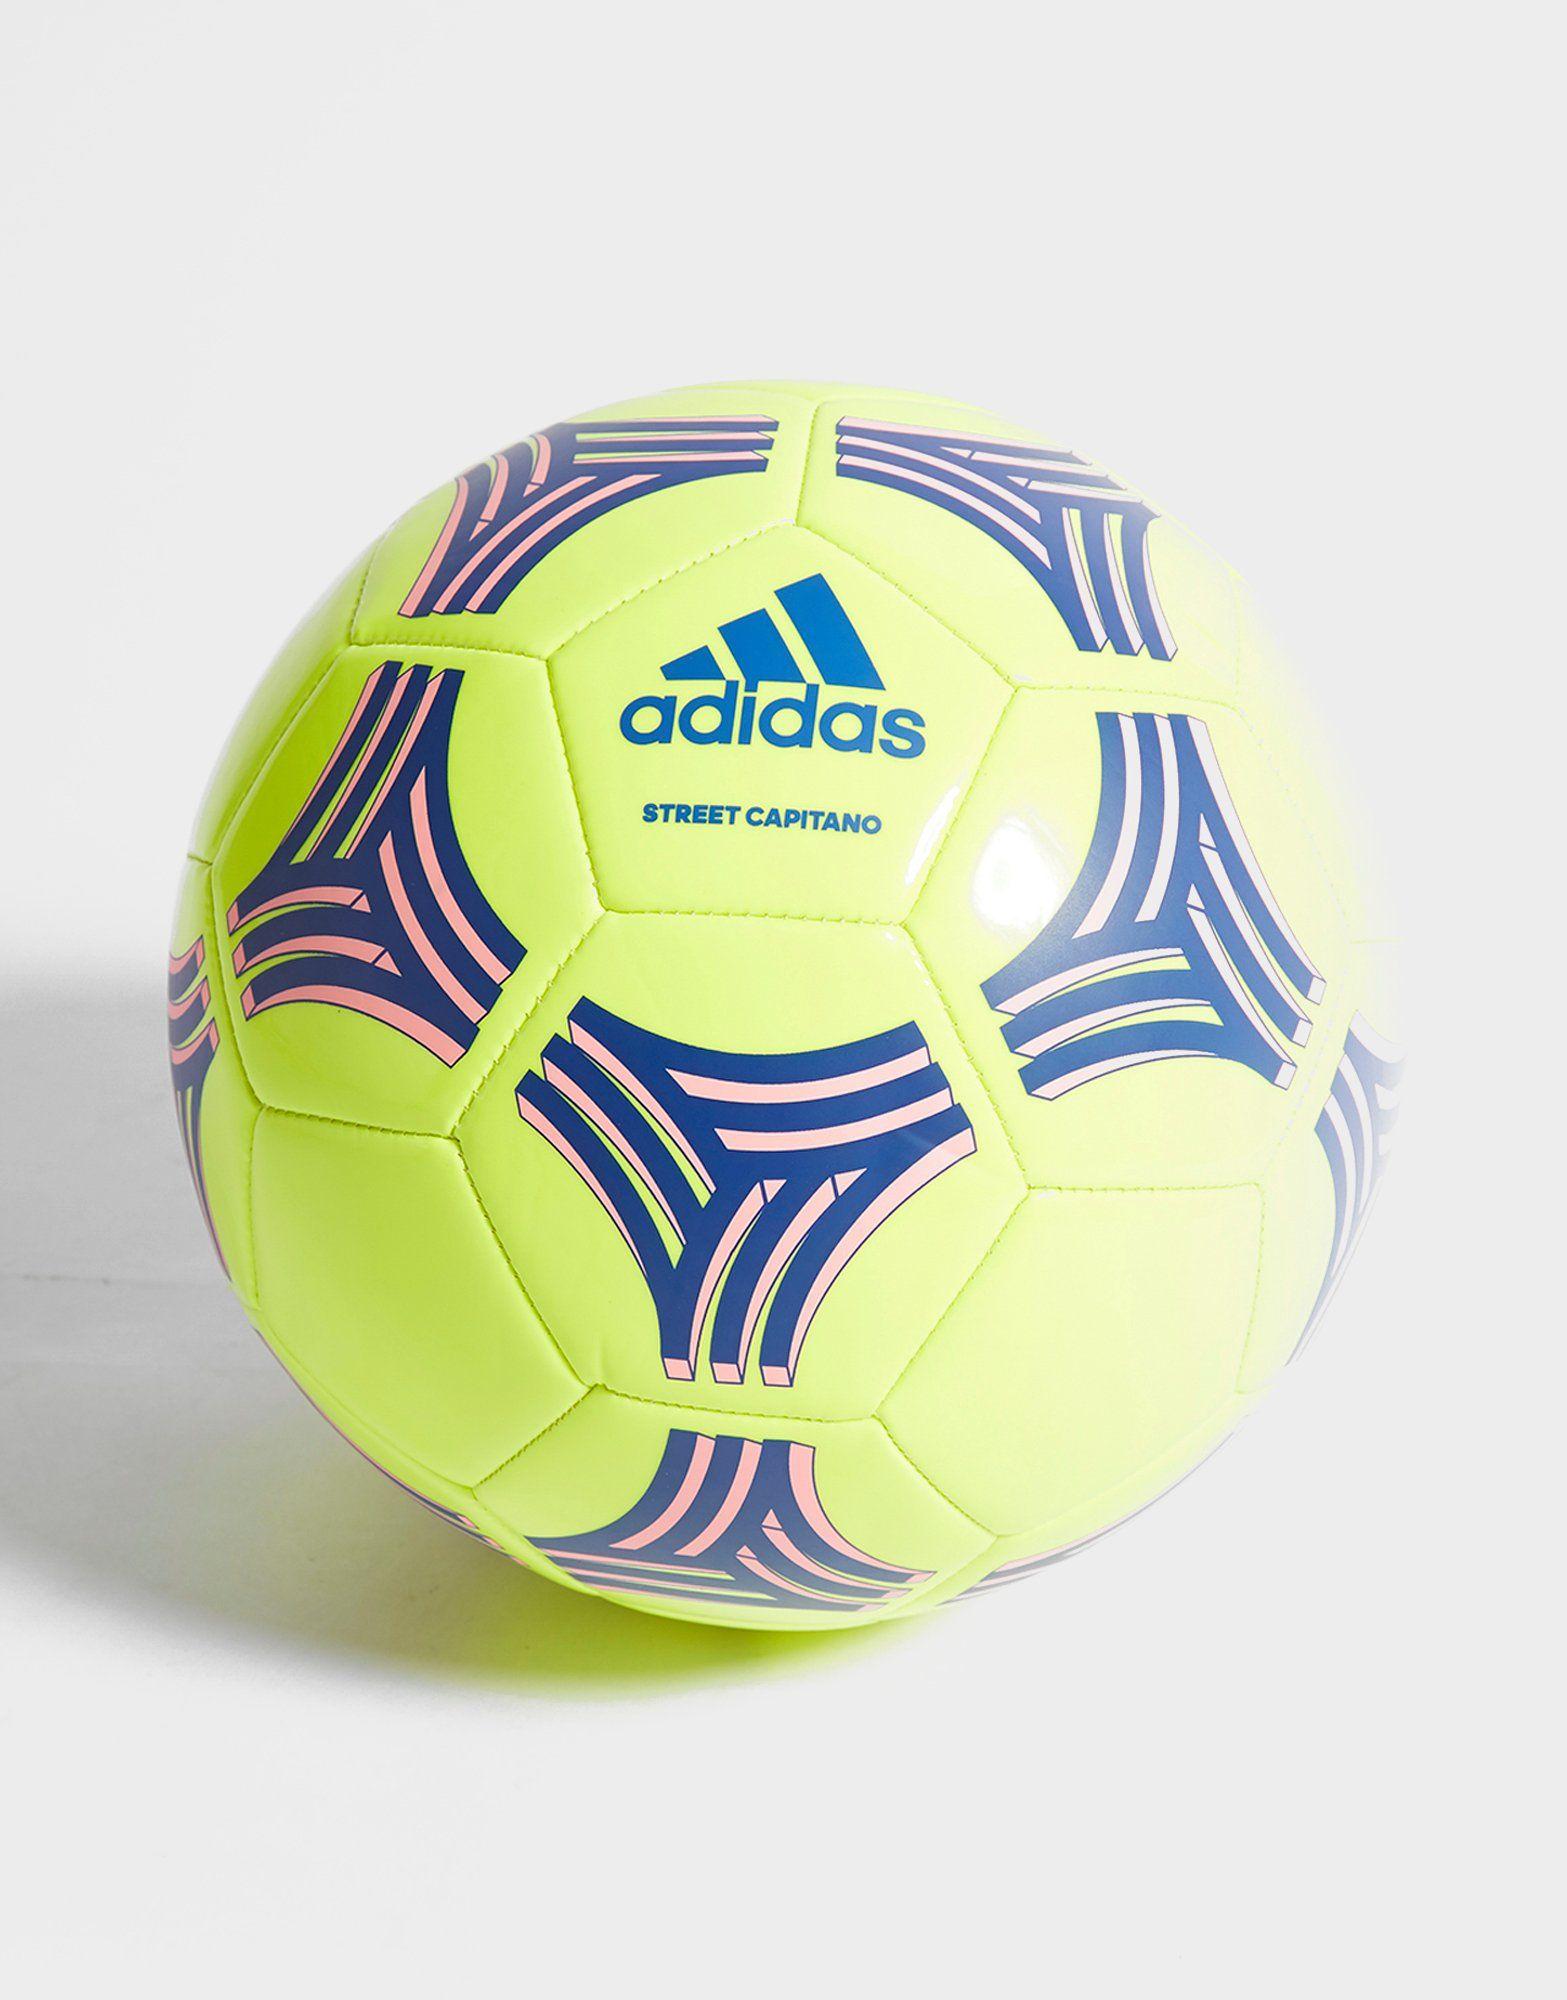 adidas Tango Street Capitano Football